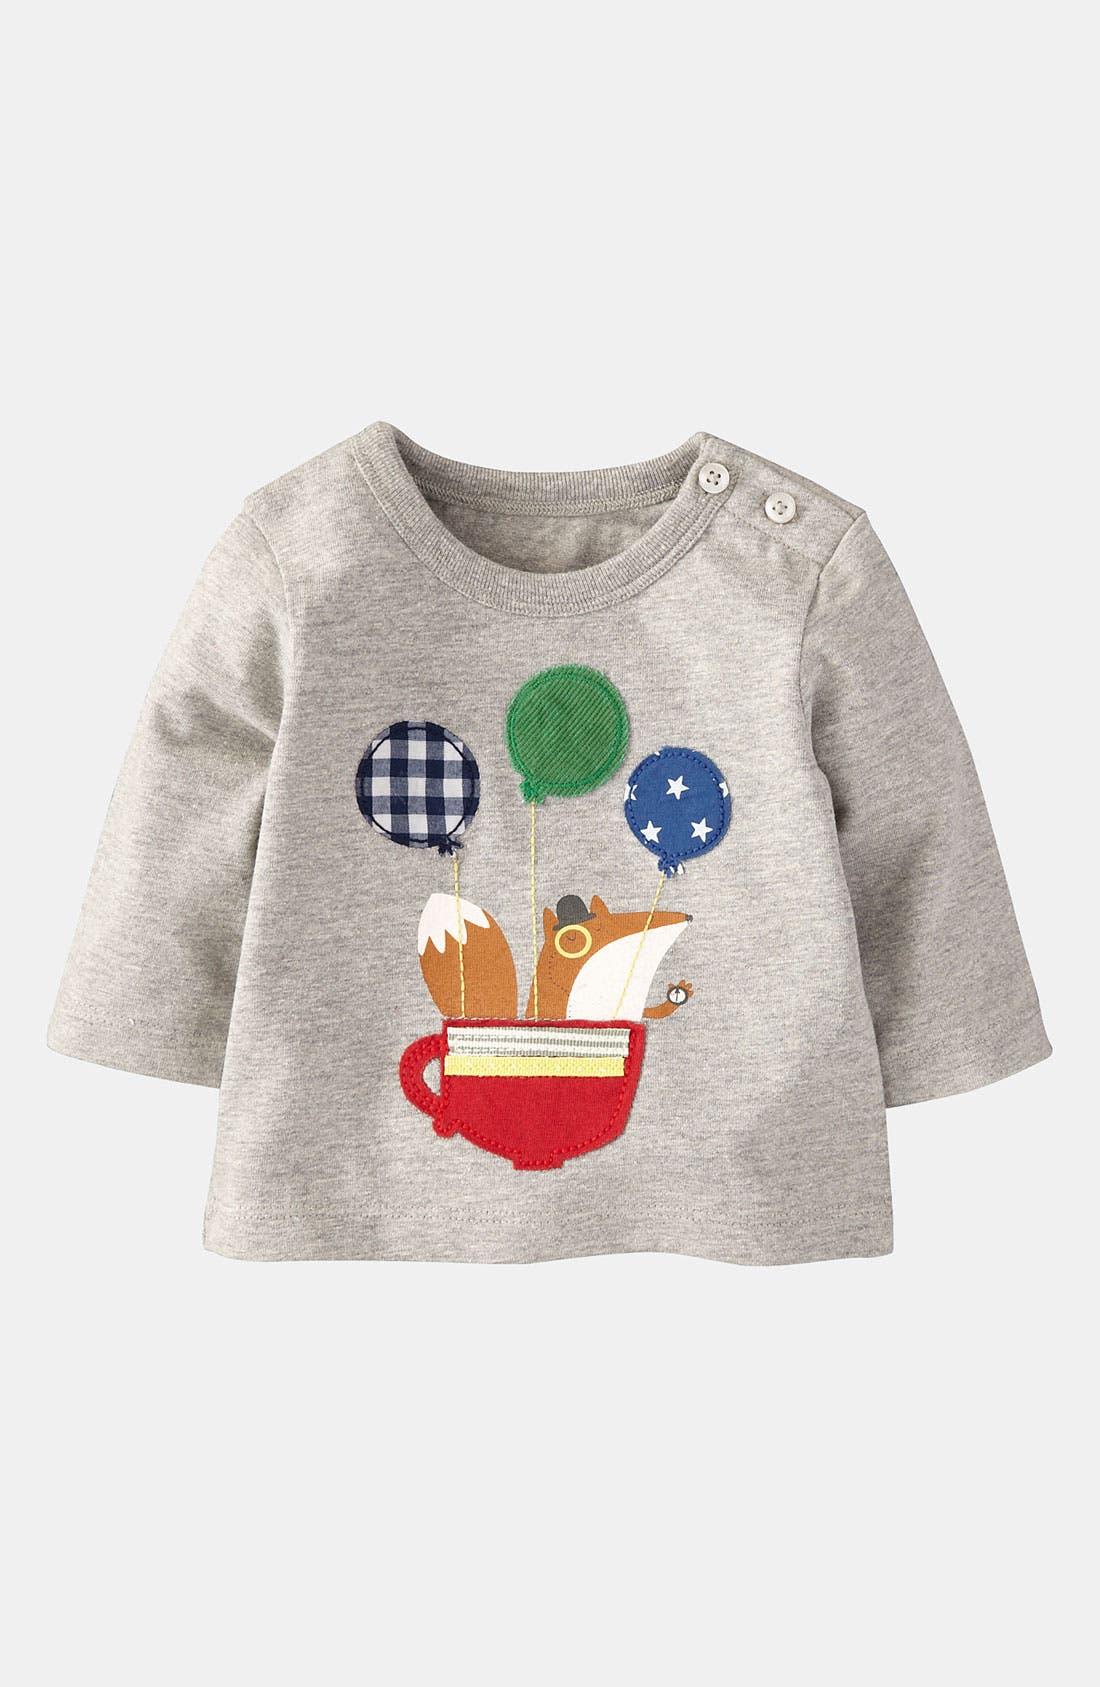 Alternate Image 1 Selected - Mini Boden 'Animal Adventures' T-Shirt (Infant)